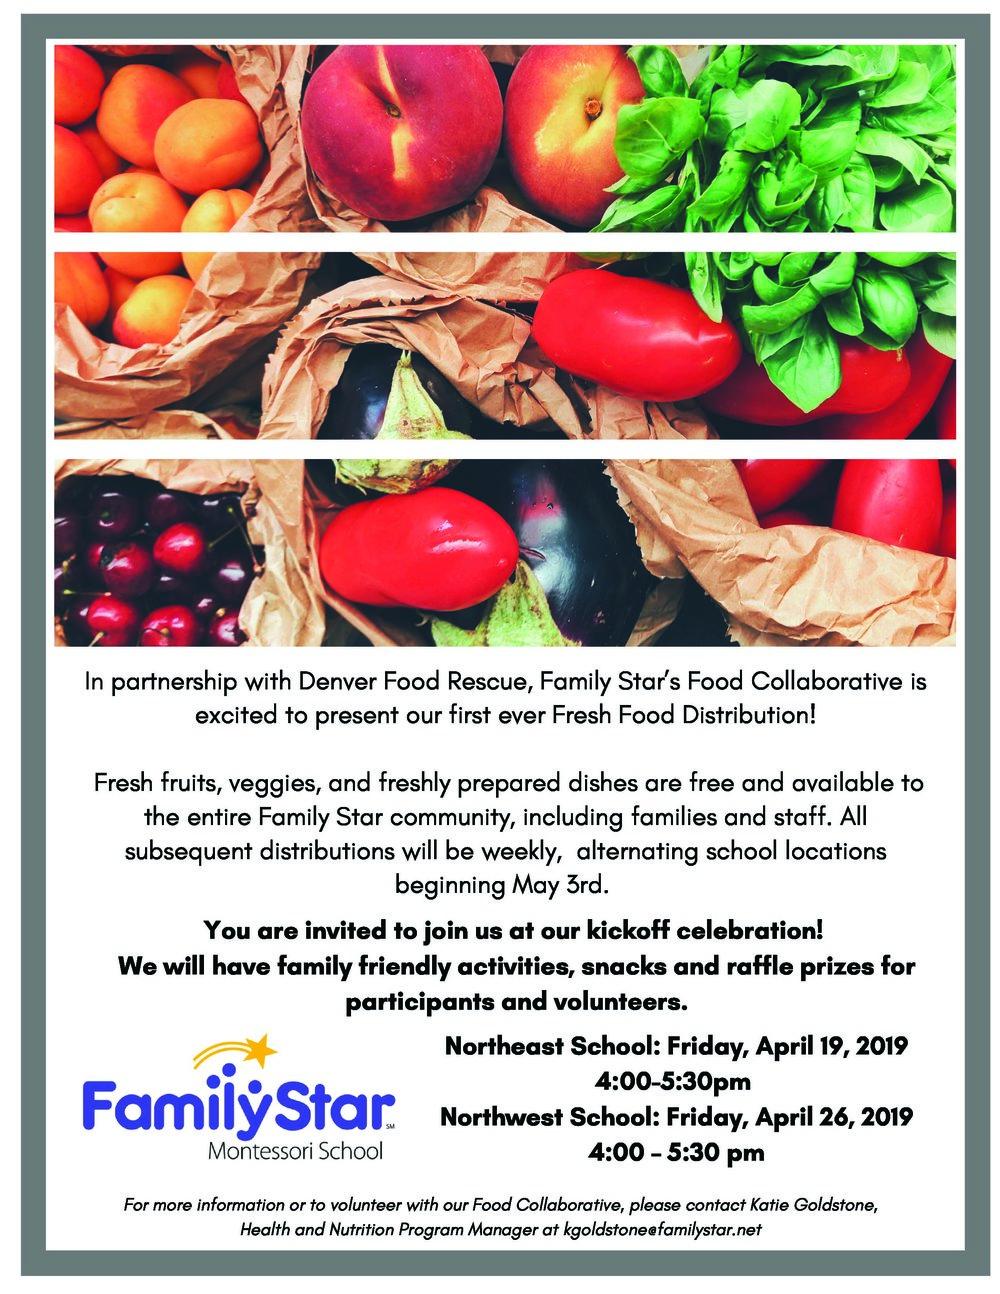 Food Collaborative Kickoff Celebration Flyer 4.11.19 FINAL.jpg